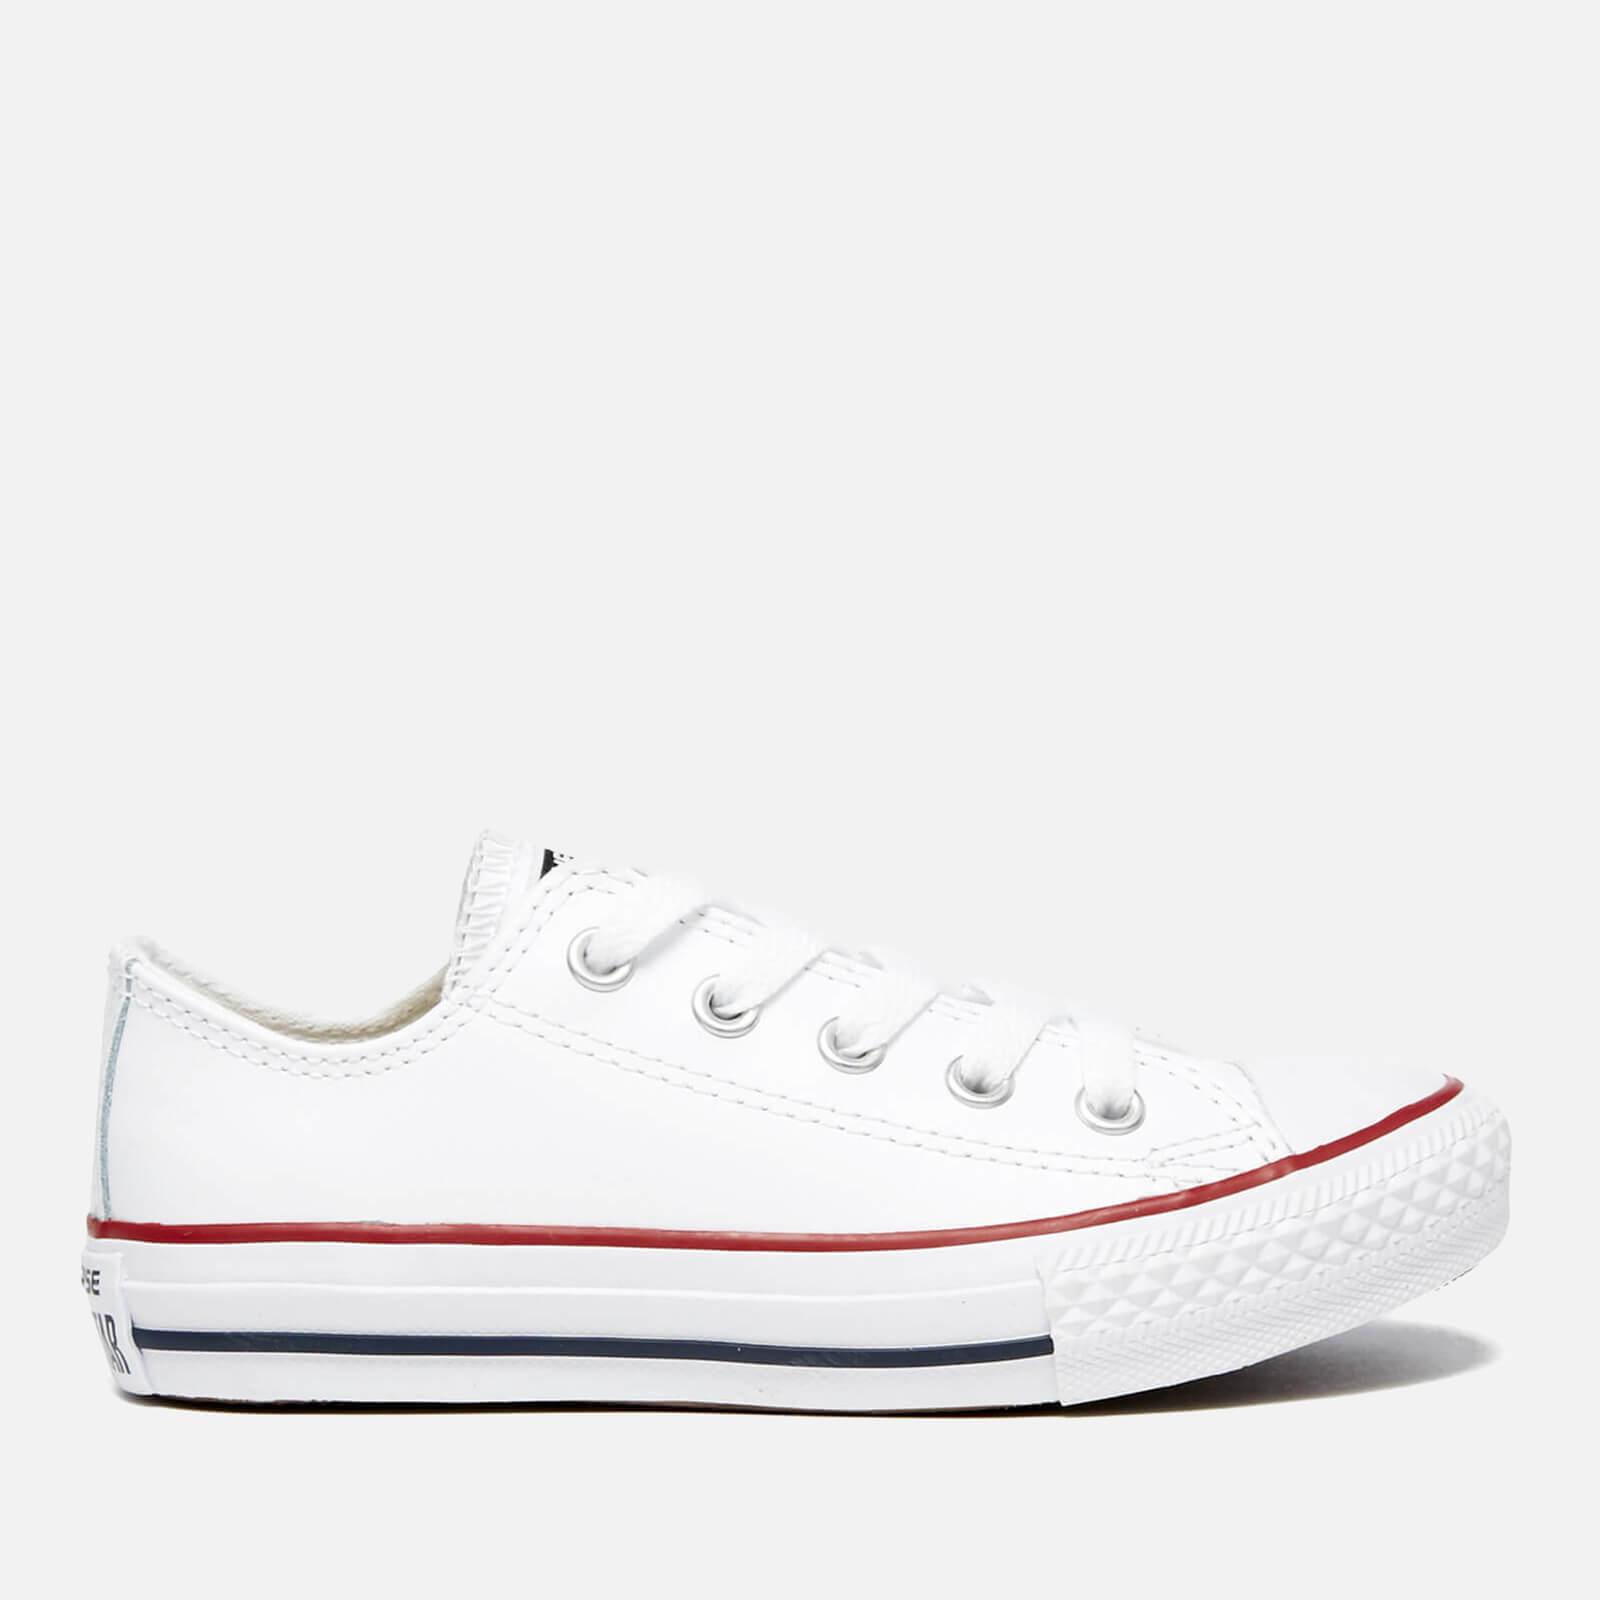 649de7fac7 Converse Kids' Chuck Taylor All Star Ox Trainers - White/Garnet/Navy ...